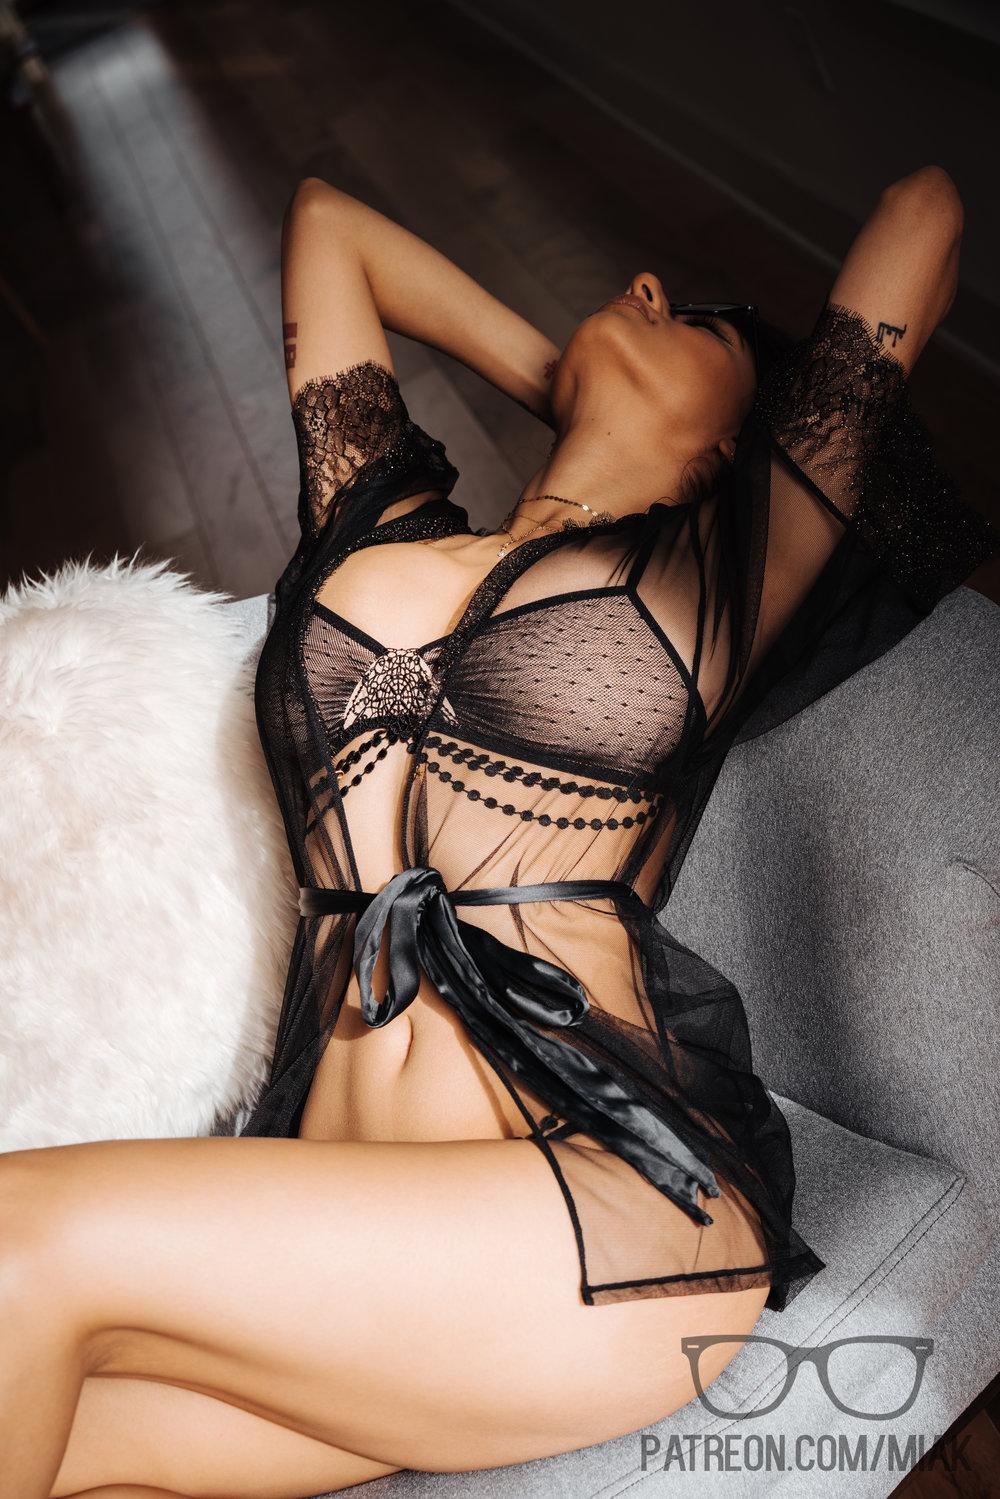 Mia Khalifa Lingerie Stiletto Heels Photoshoot Leaked 0023